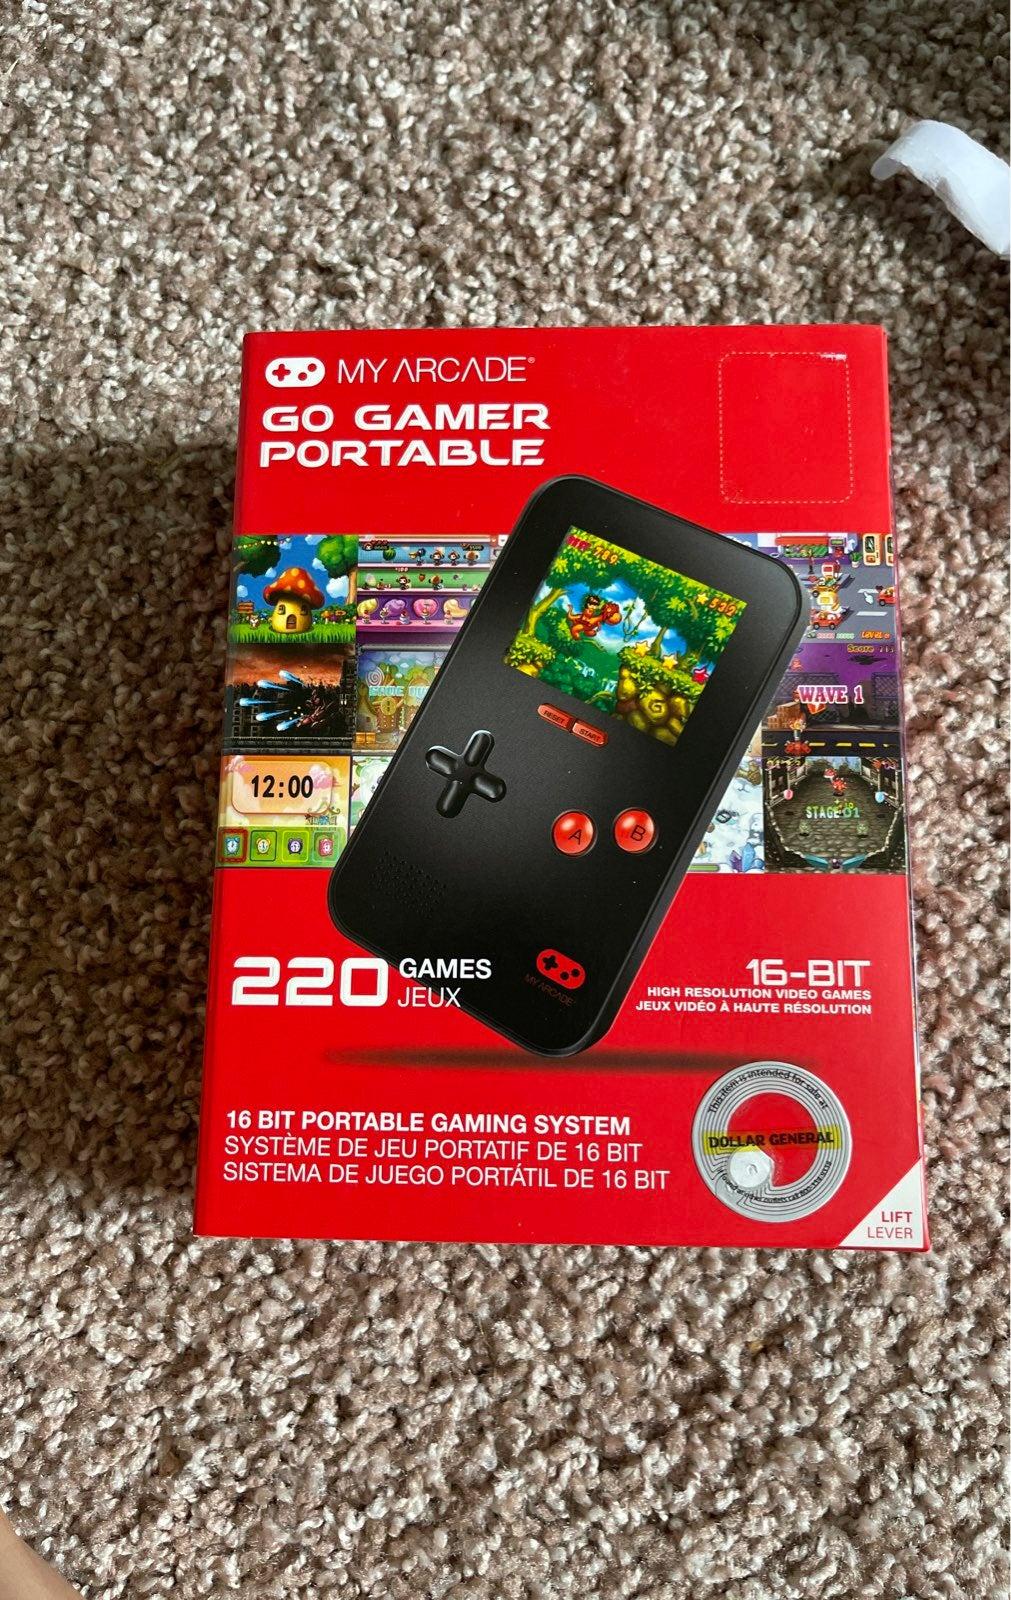 Go gamer portable